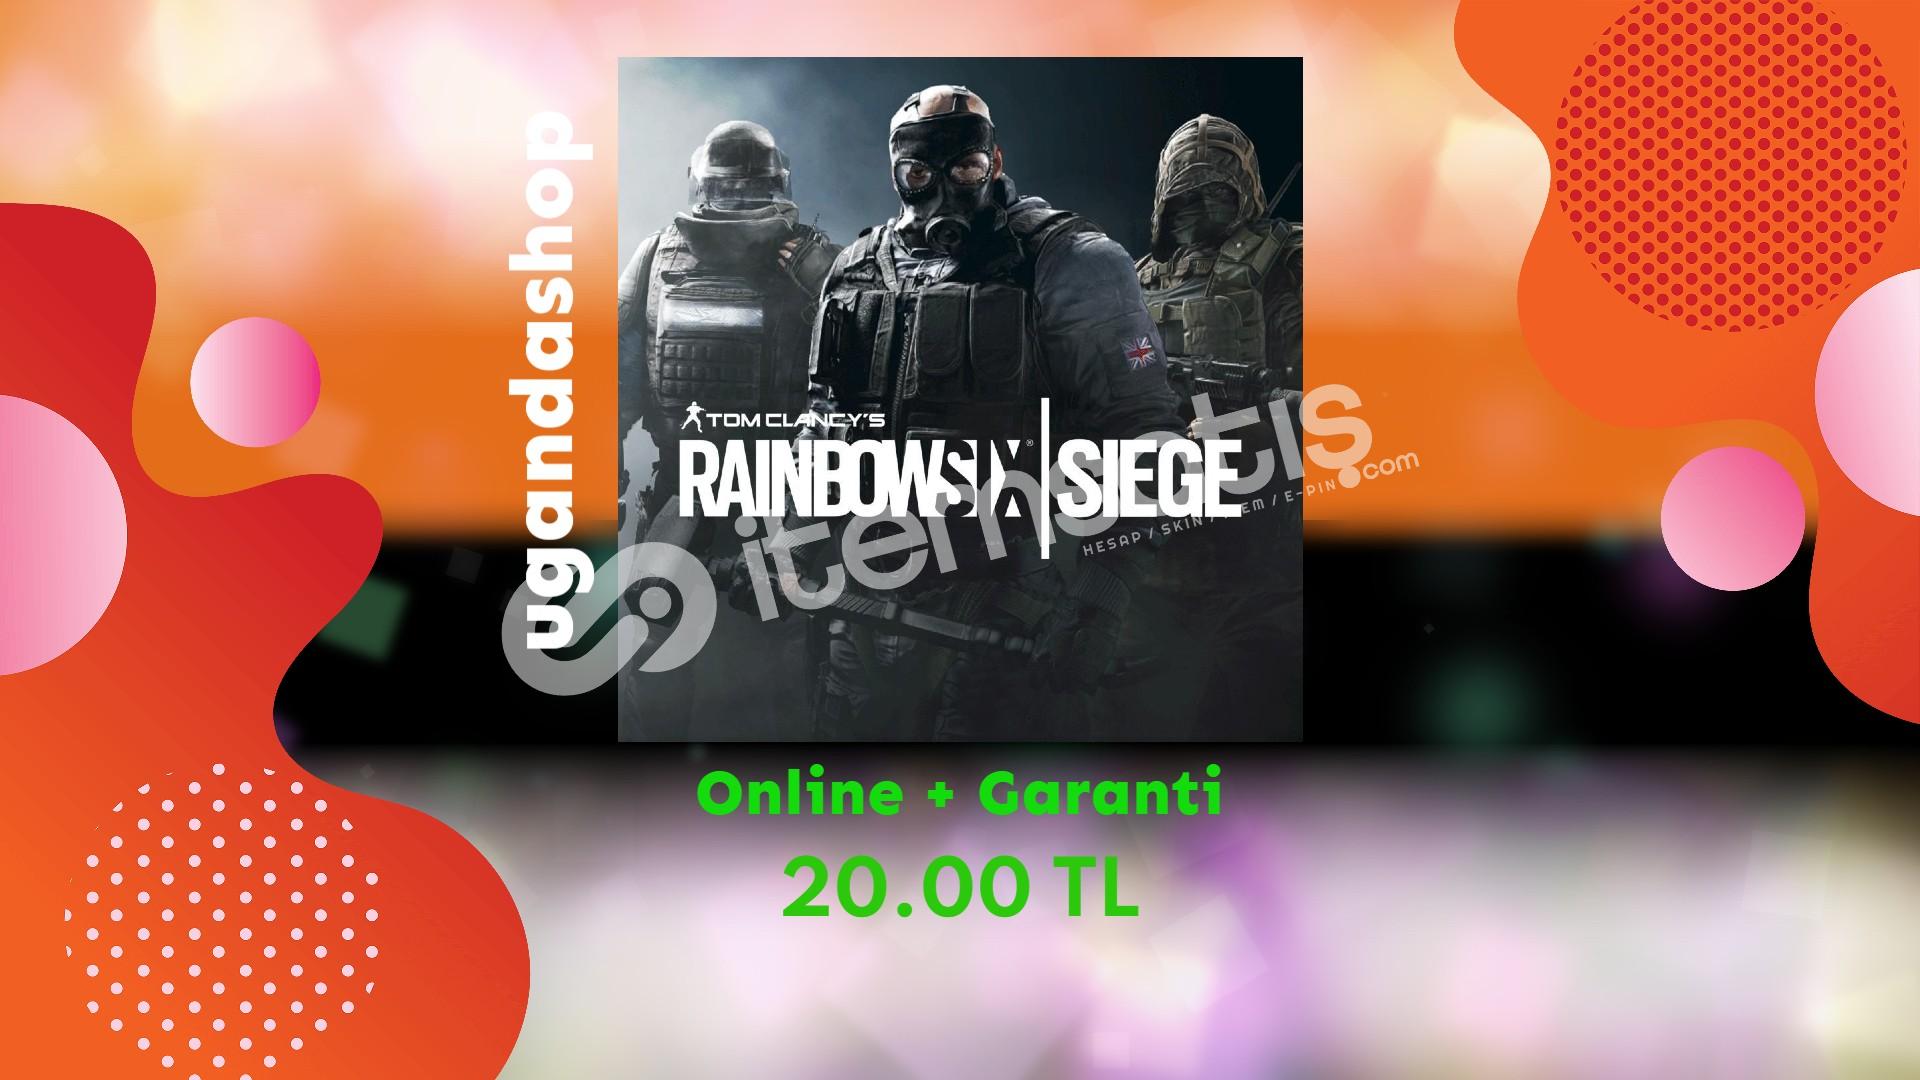 Rainbow Six Siege Online Uplay/Ubisoft Hesap + Garanti